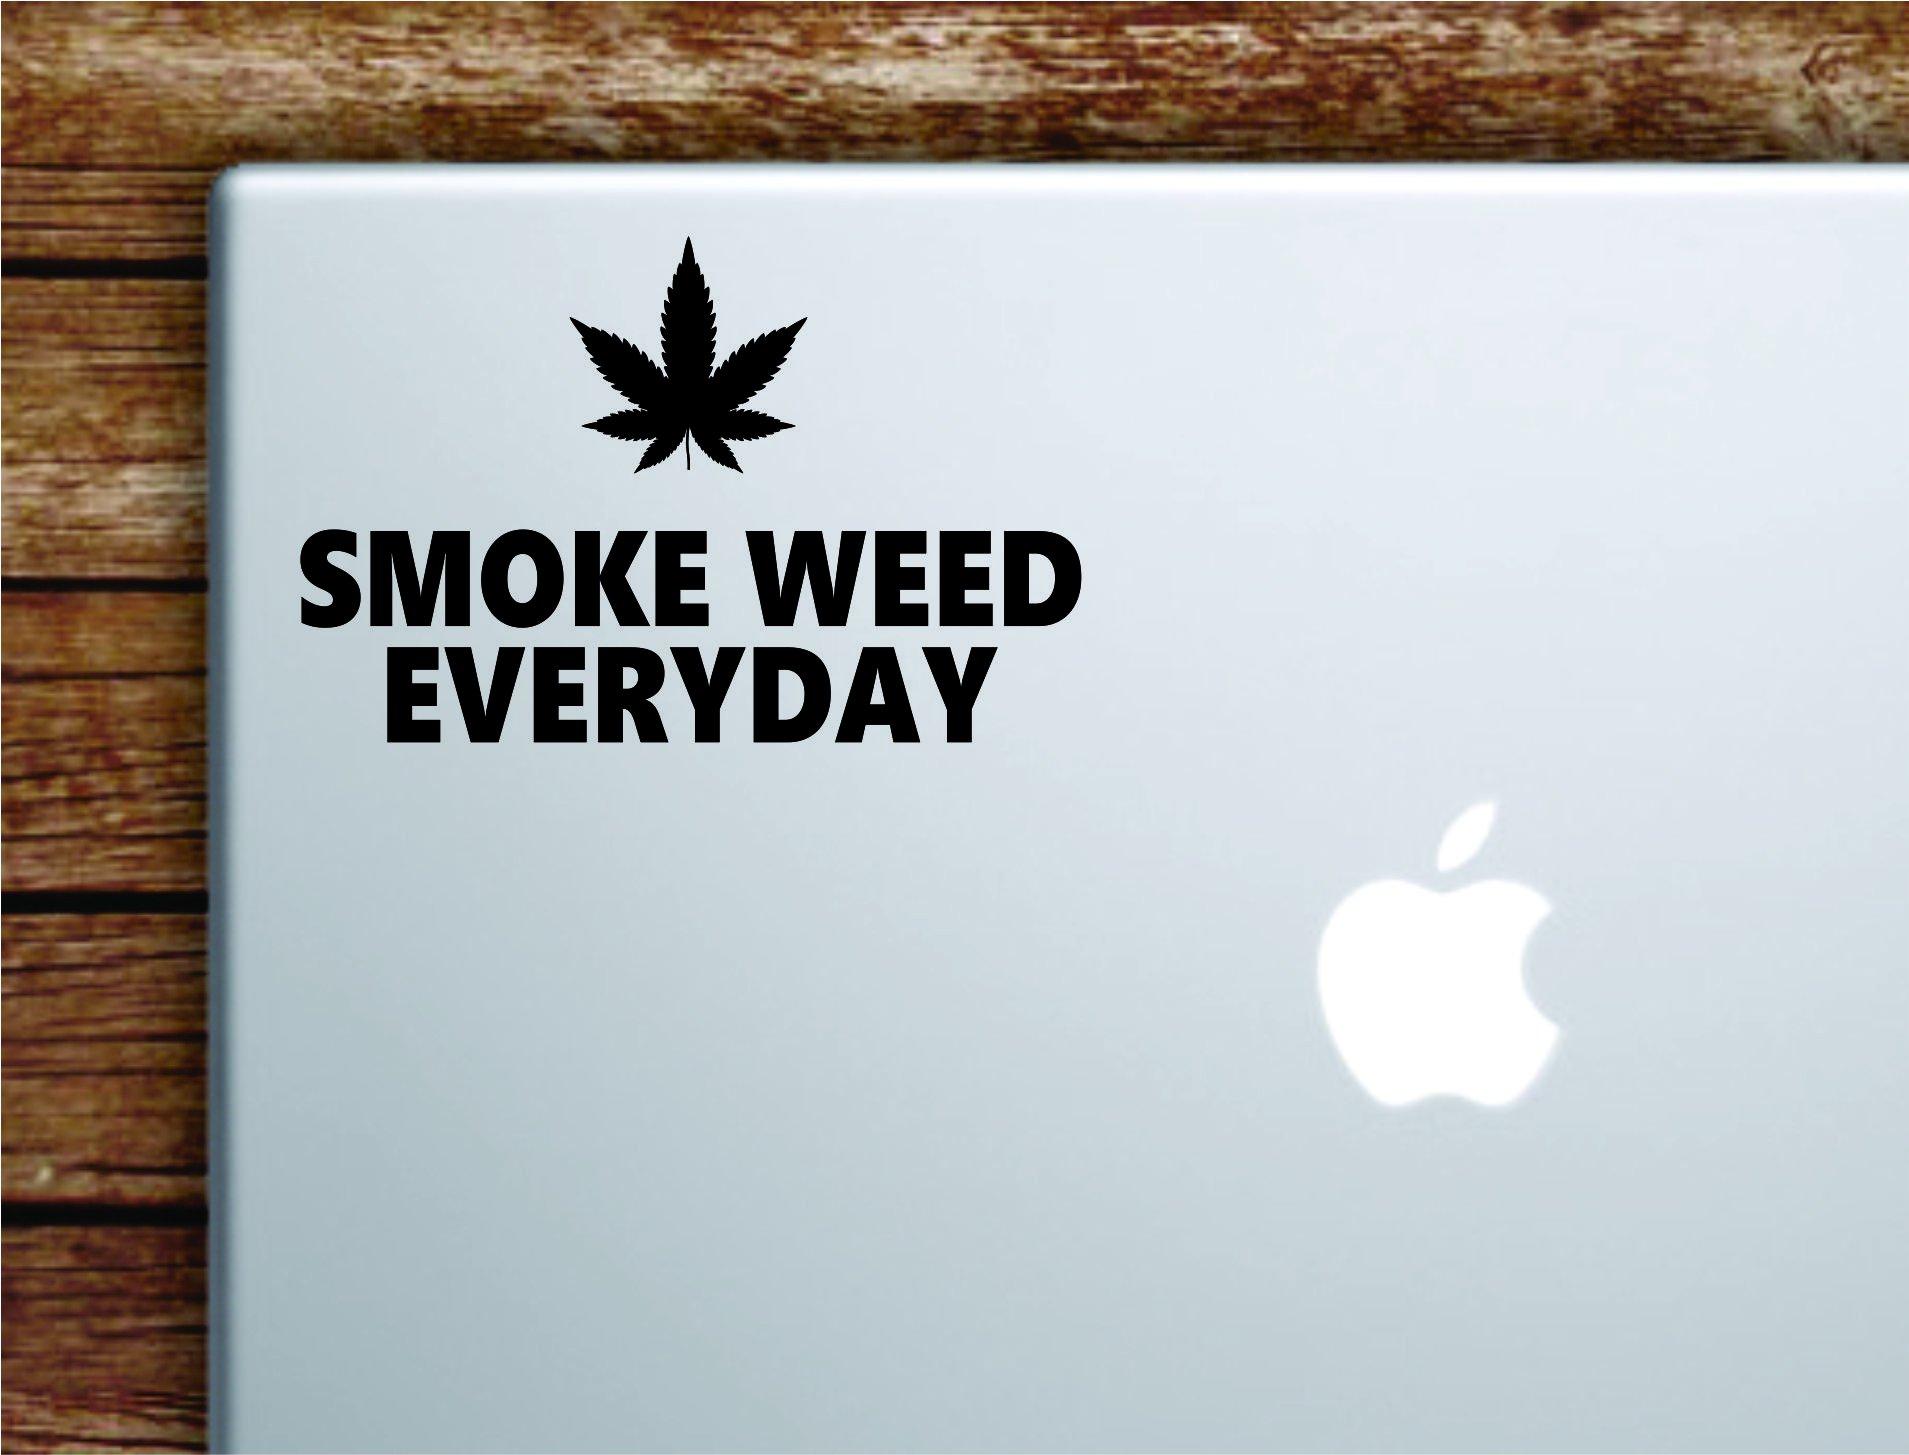 Boop Decals Smoke Weed Everyday Laptop Apple Macbook Quote Wall Decal Sticker Art Vinyl Inspirational Motivational Funny Rap Hip Hop Music Lyrics